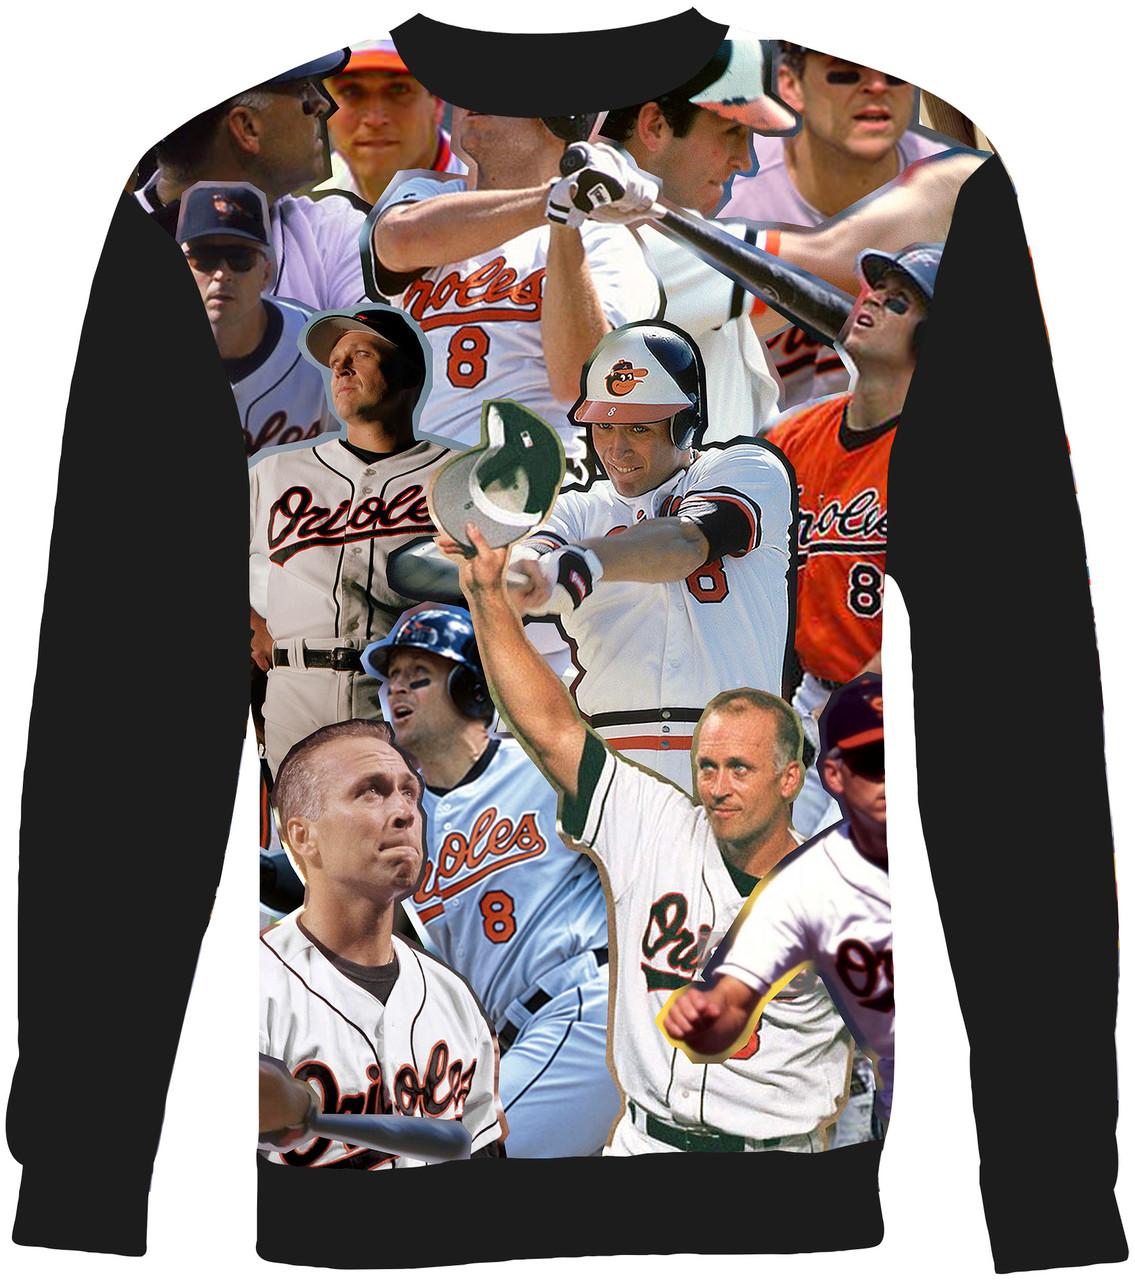 new style 72ff4 f6f4f Cal Ripken Jr. Collage Sweater Sweatshirt